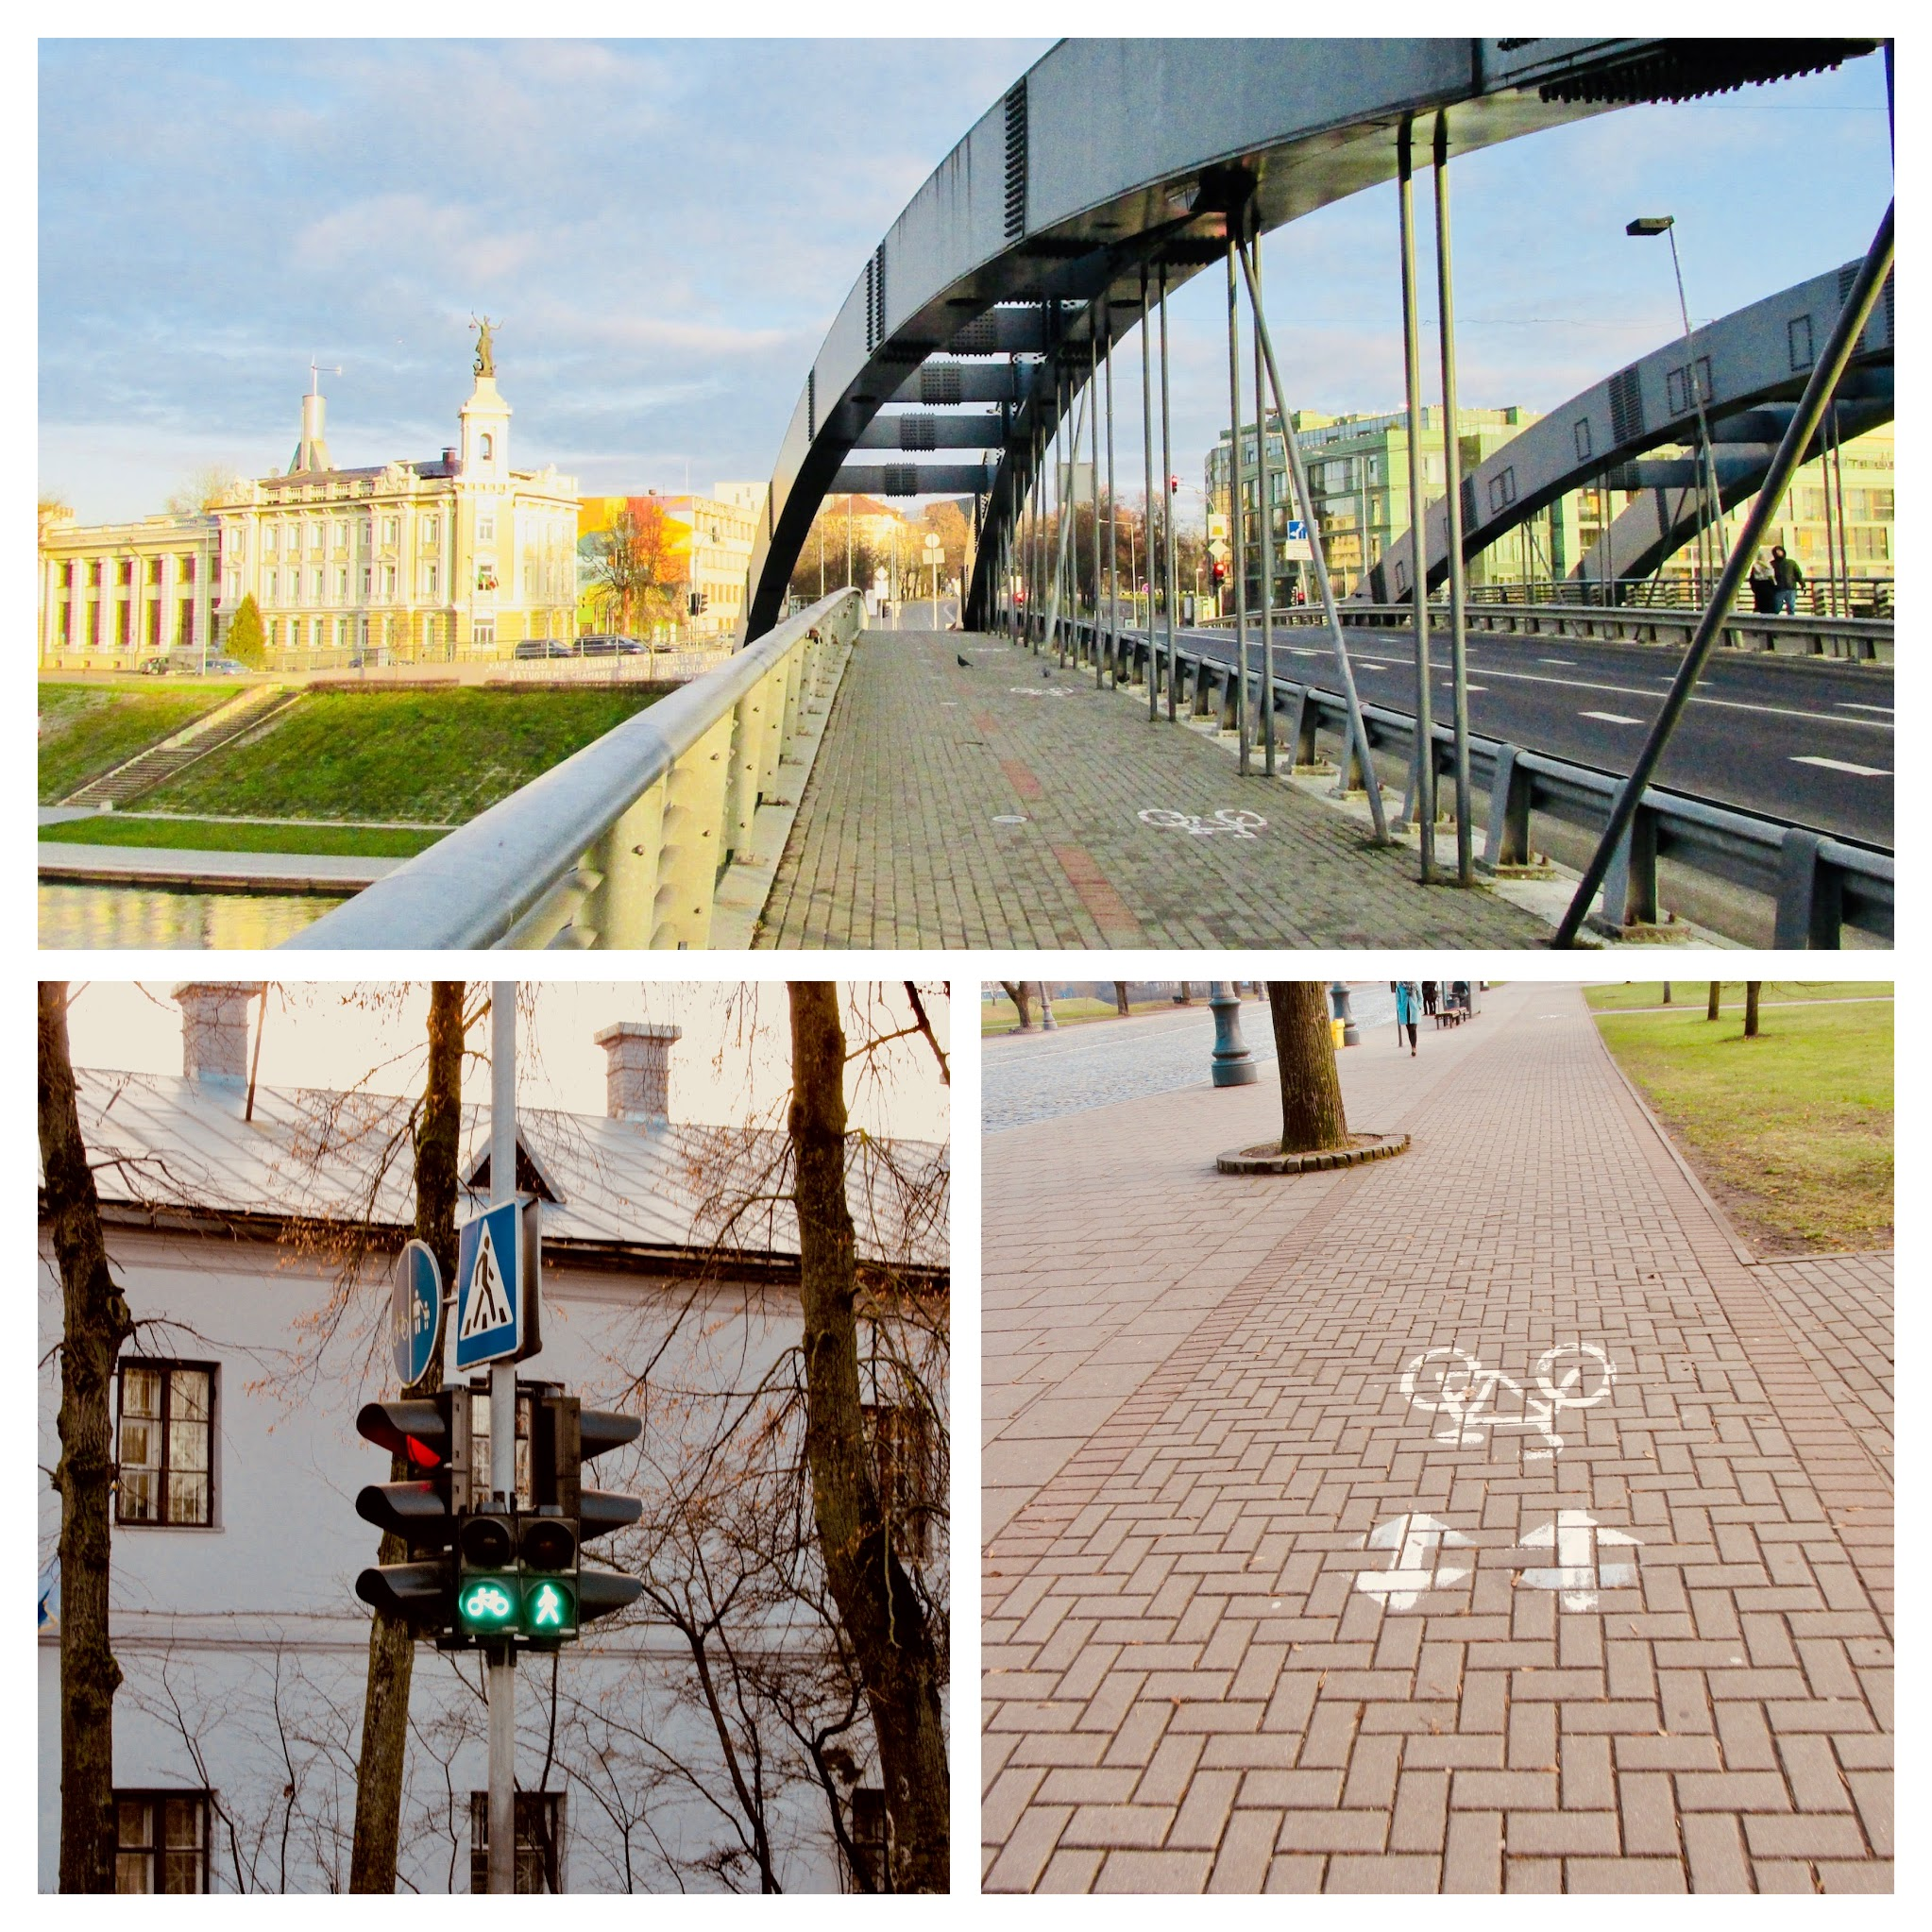 Infrastructure in Vilnius